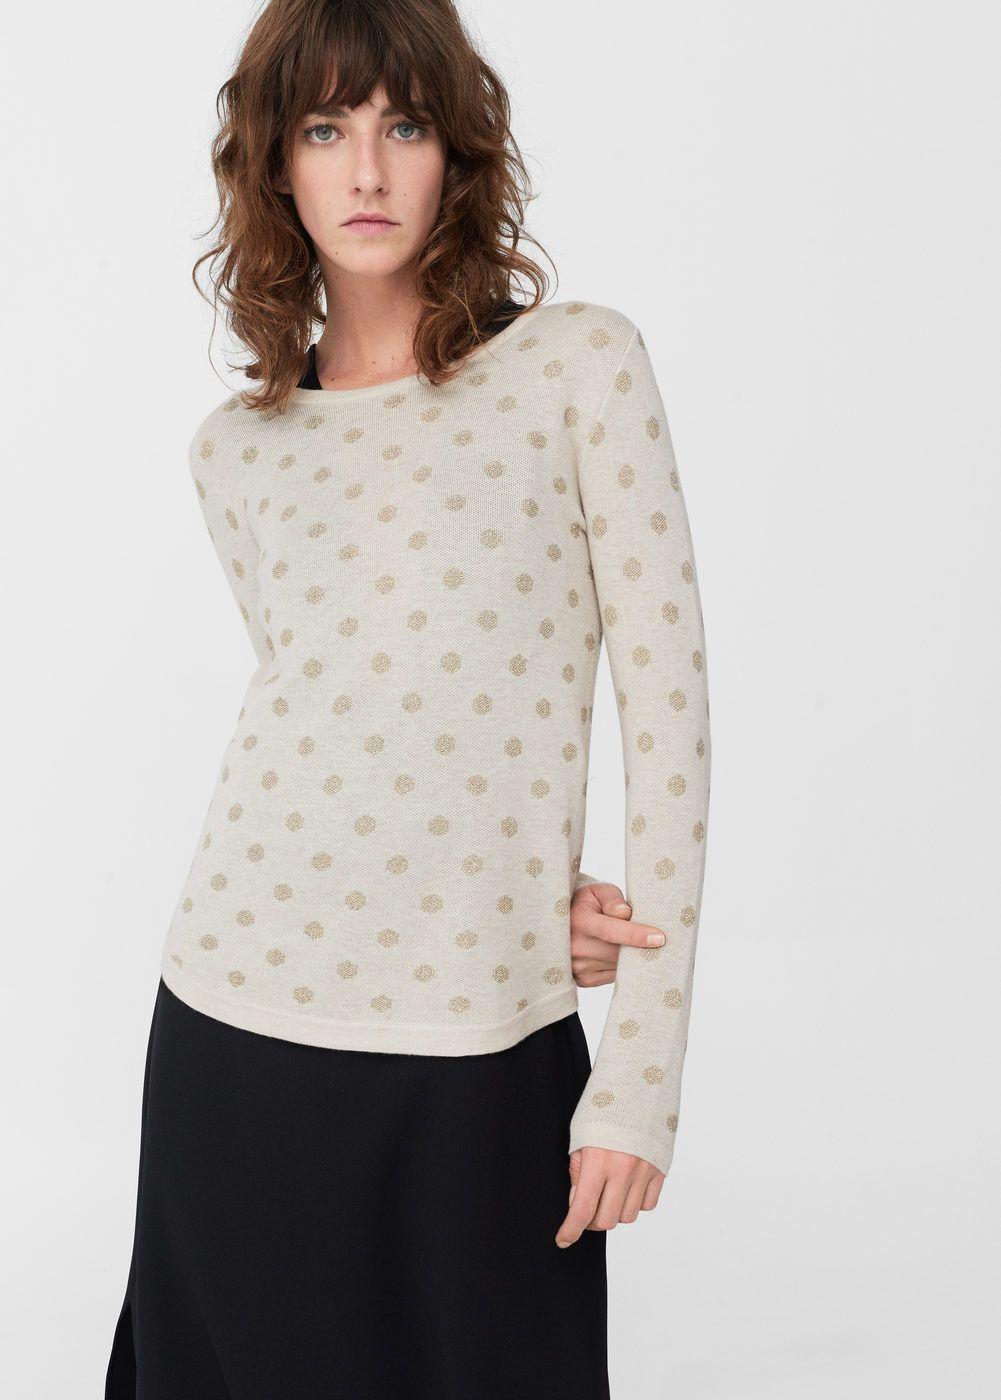 6045696acc9 Càrdigans i jerseis  woman  fashion  mango  barcelona  white  gold ...